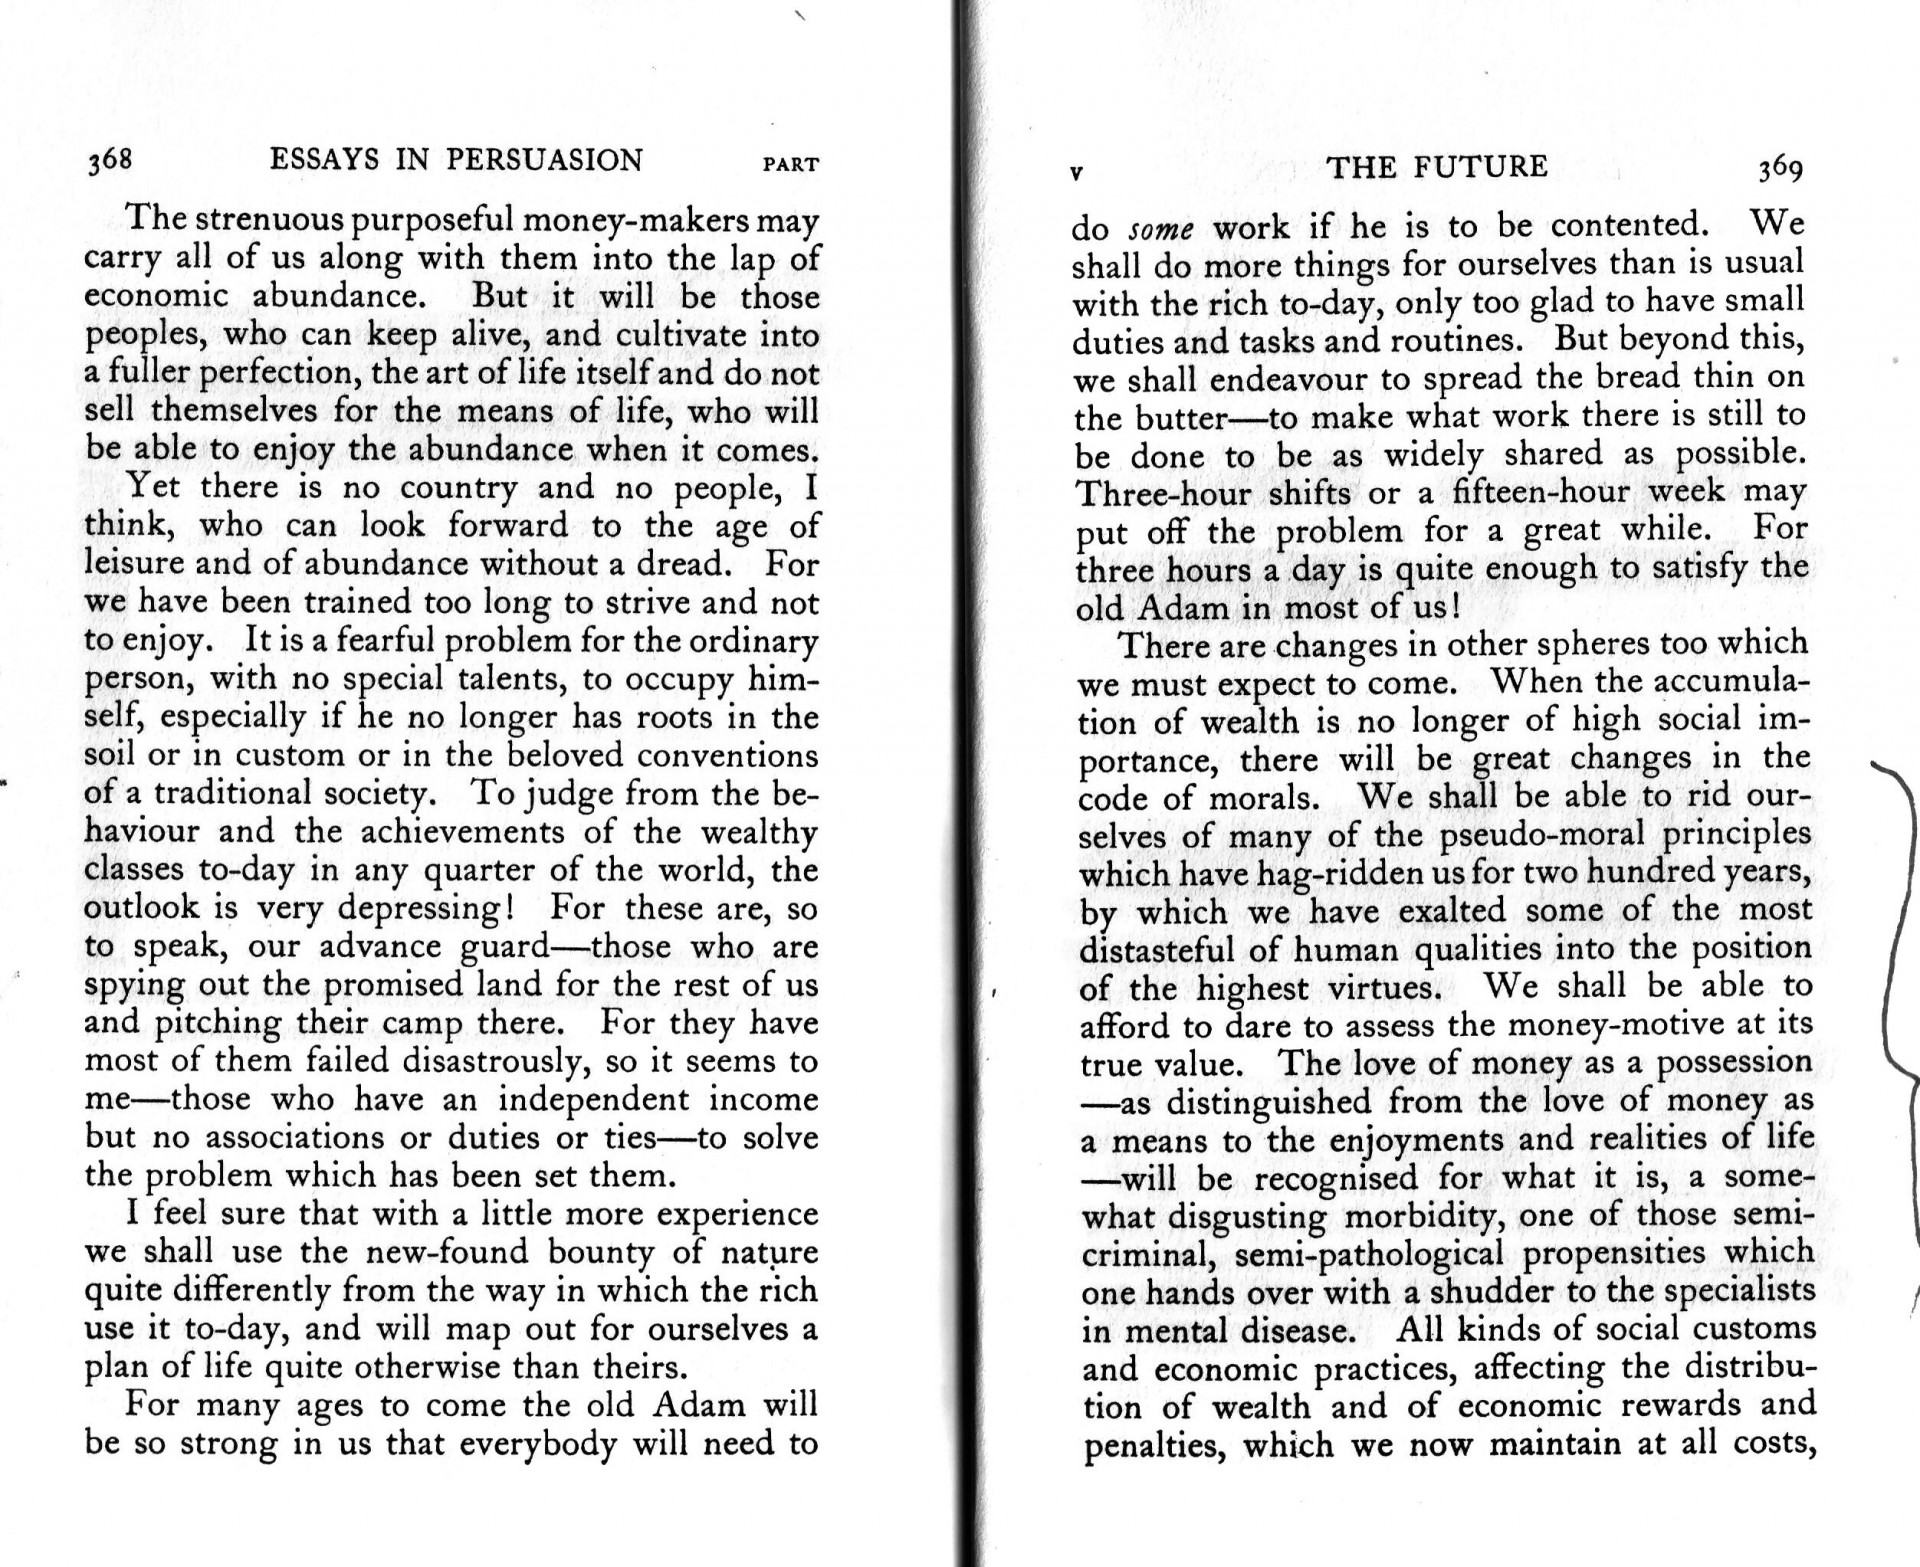 026 Essays In Persuasion Essay Remarkable Audiobook Pdf John Maynard Keynes Summary 1920